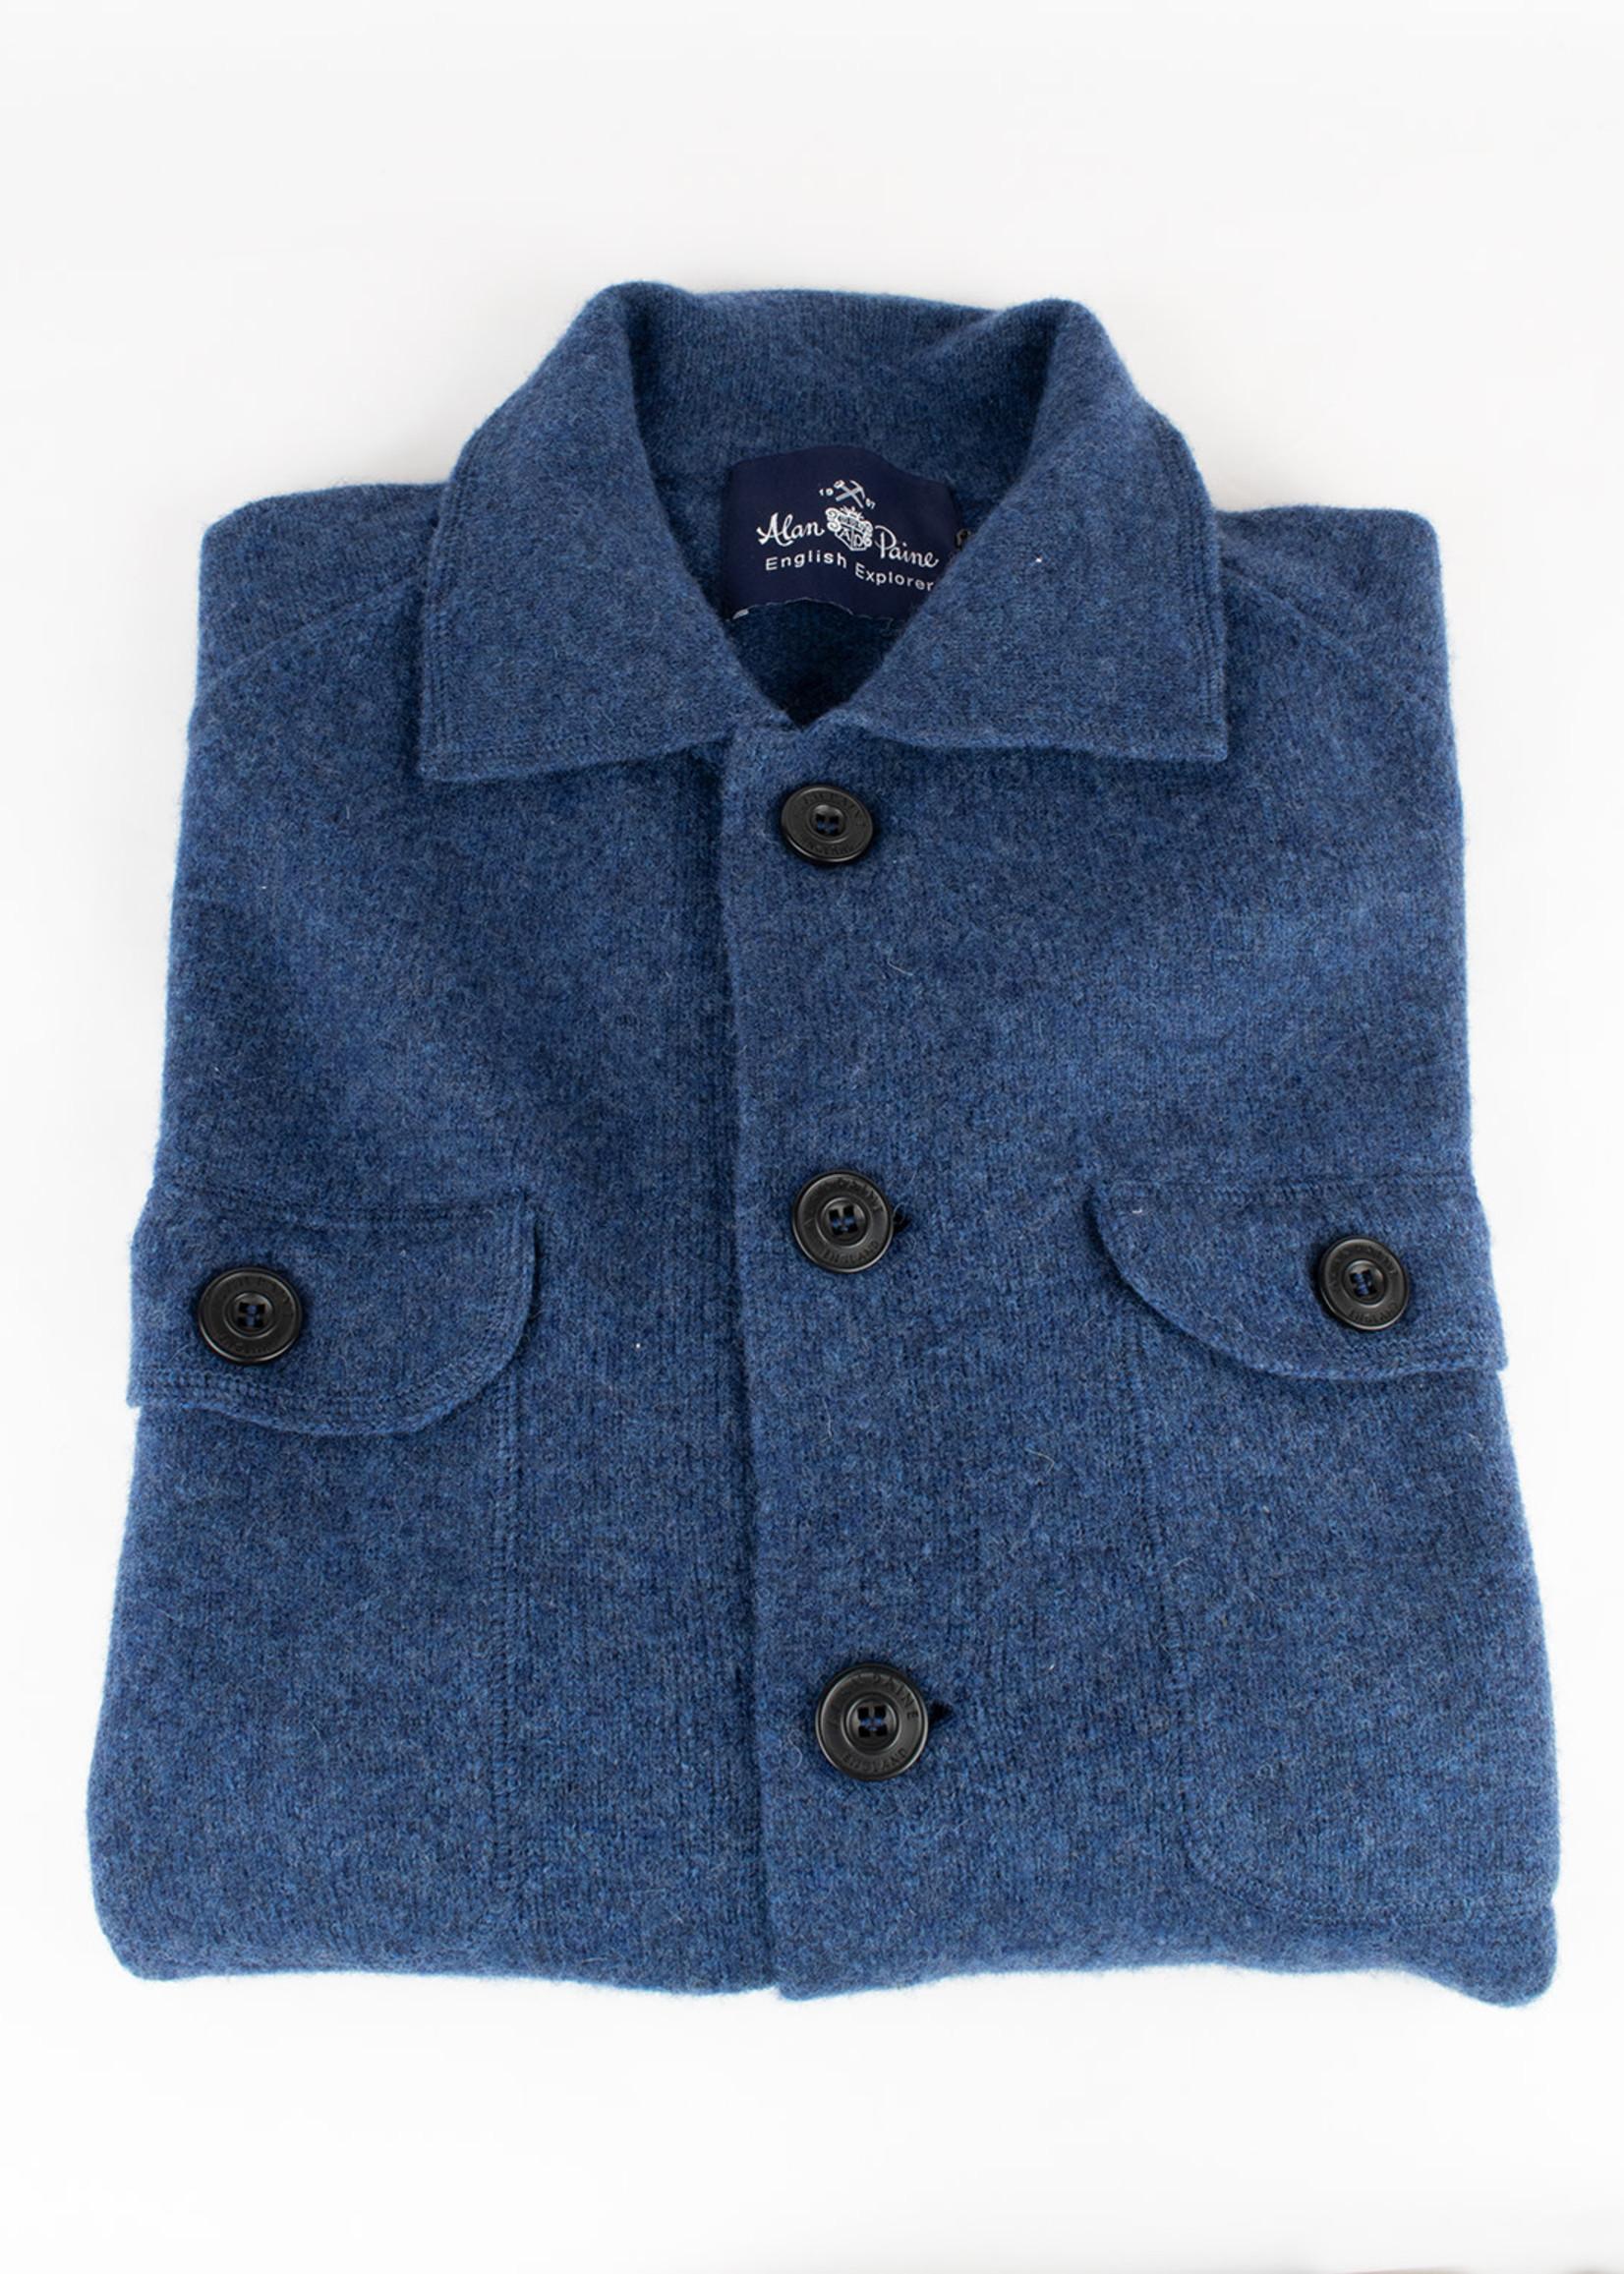 Alan Paine Alan Paine Tutbury Rhapsody Boiled Lambswool Knit Shirt